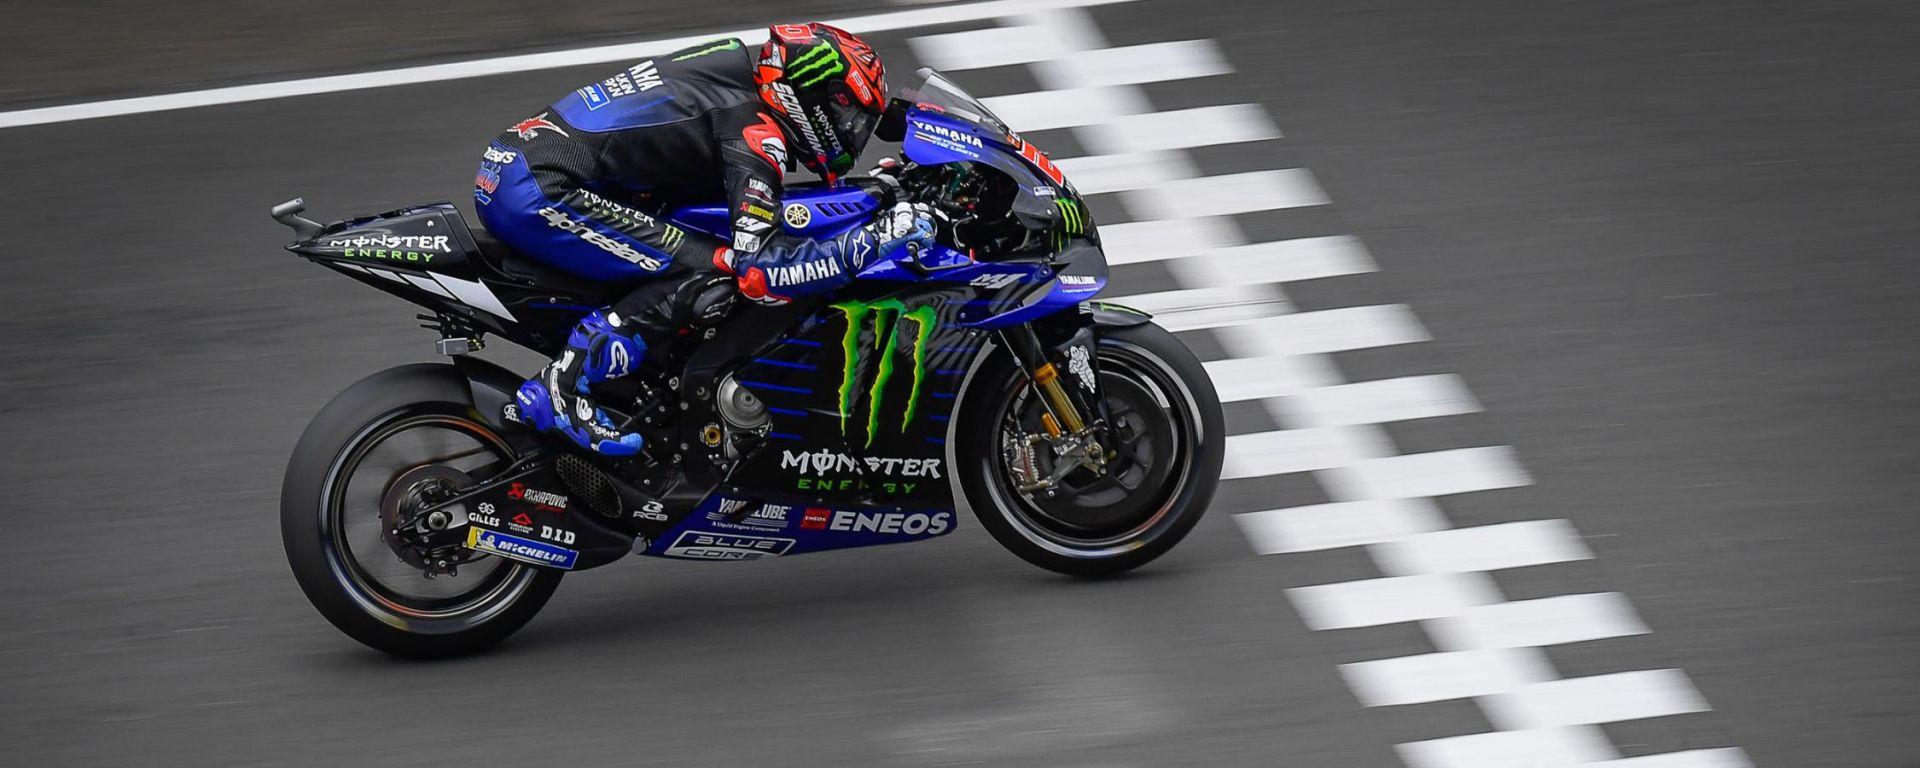 MotoGP Francia 2021, Le Mans: Fabio Quartararo (Yamaha)